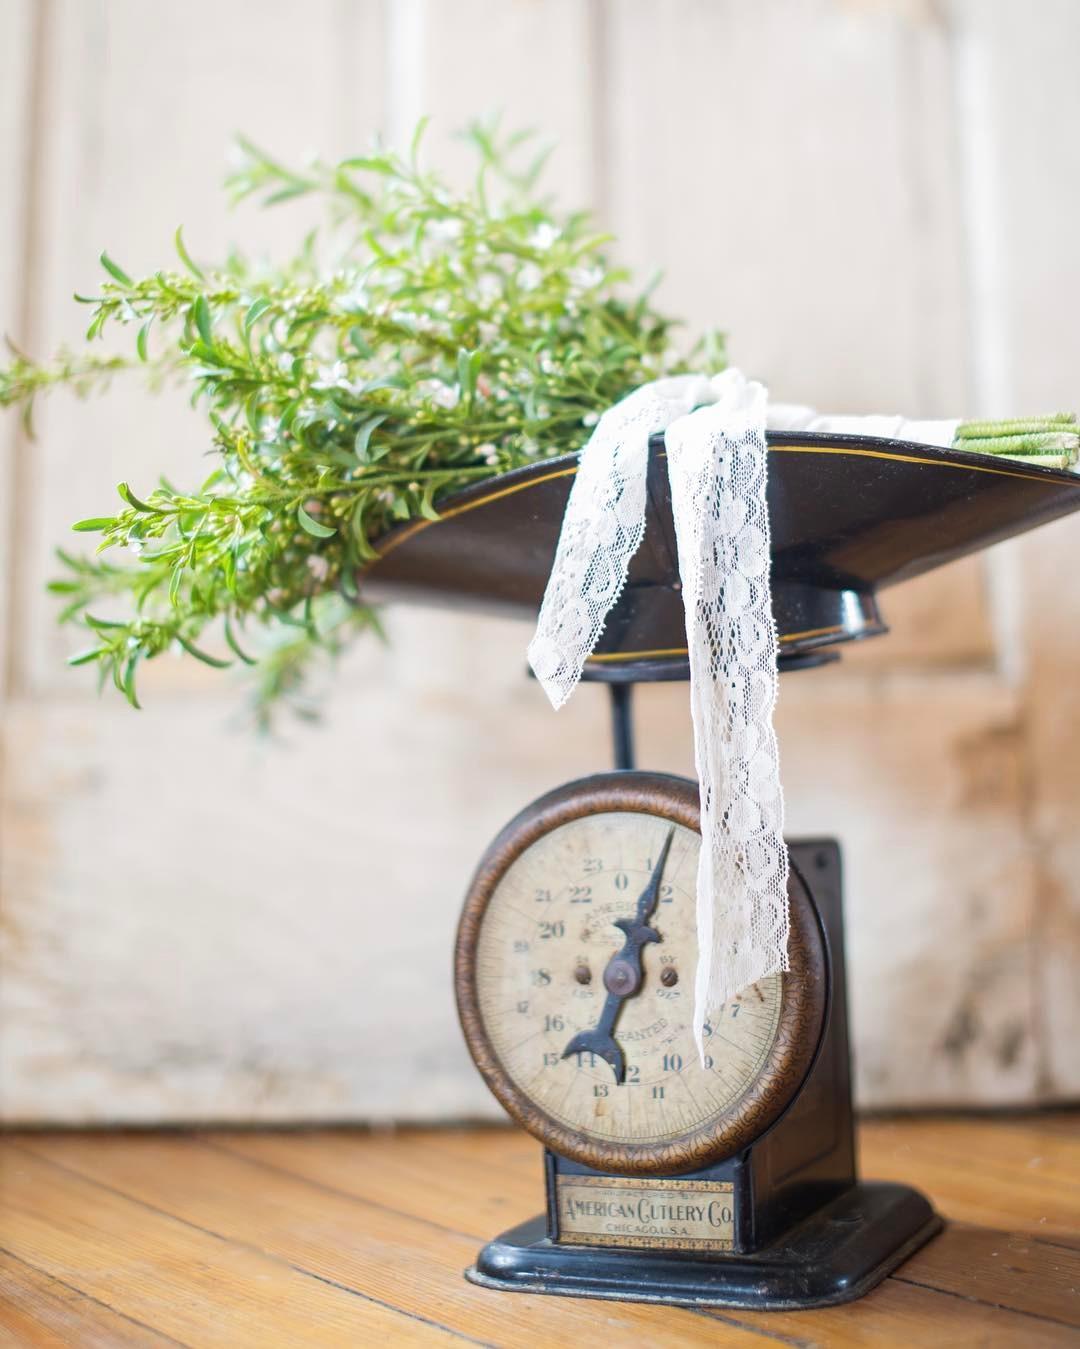 {simple} photo | @simpell_photo_design  #vintage #simple #bouquet #greenery #photoshoot #lotusfloraldesigns #flowerart